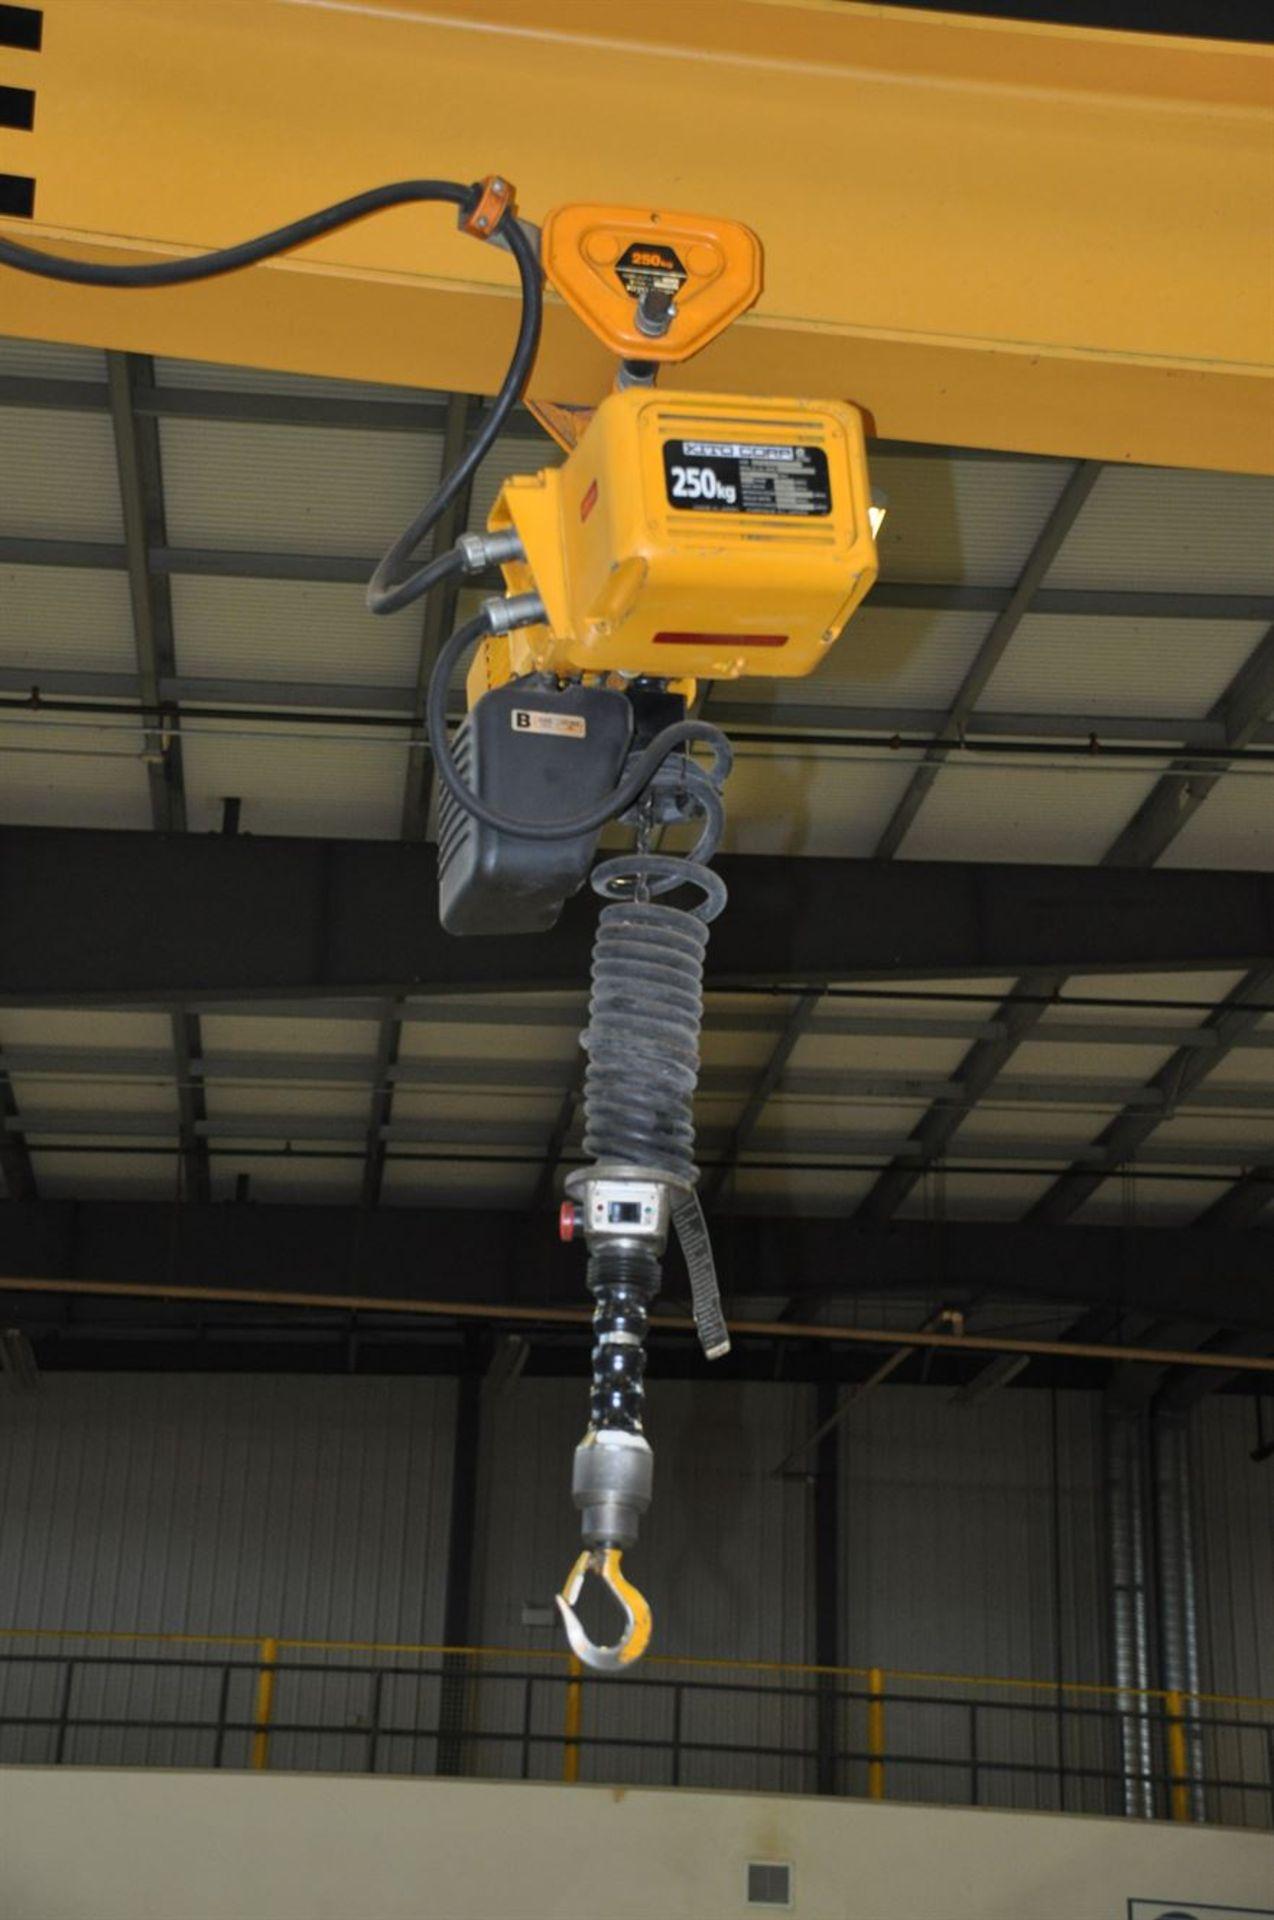 TEKO ¼ Tonne Free Standing Jib Crane, w/ KITO 250 kg Electric Chain Hoist